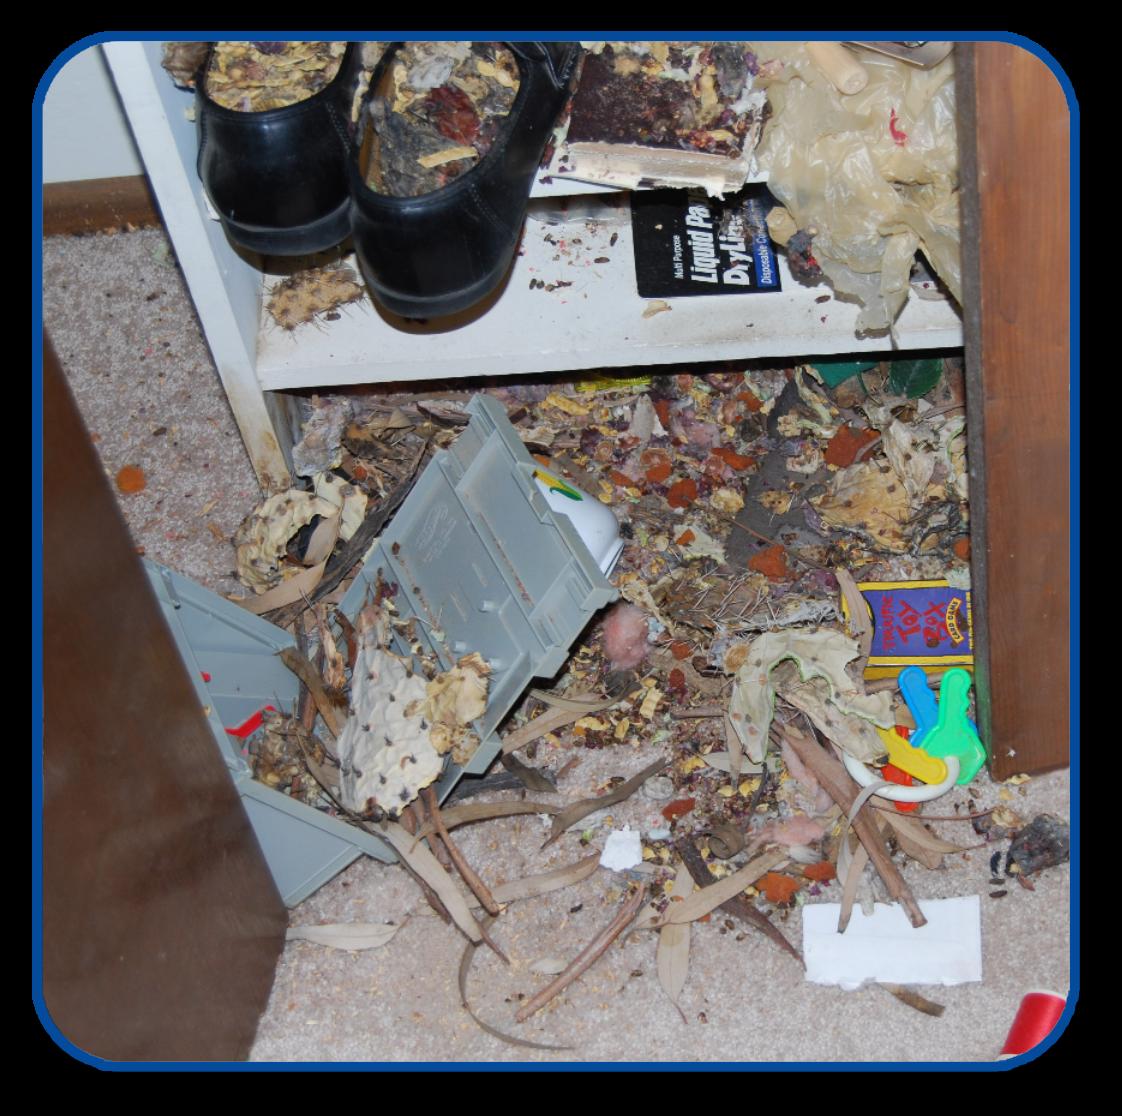 Pack rat mess found inside a closet Pest control, Pests